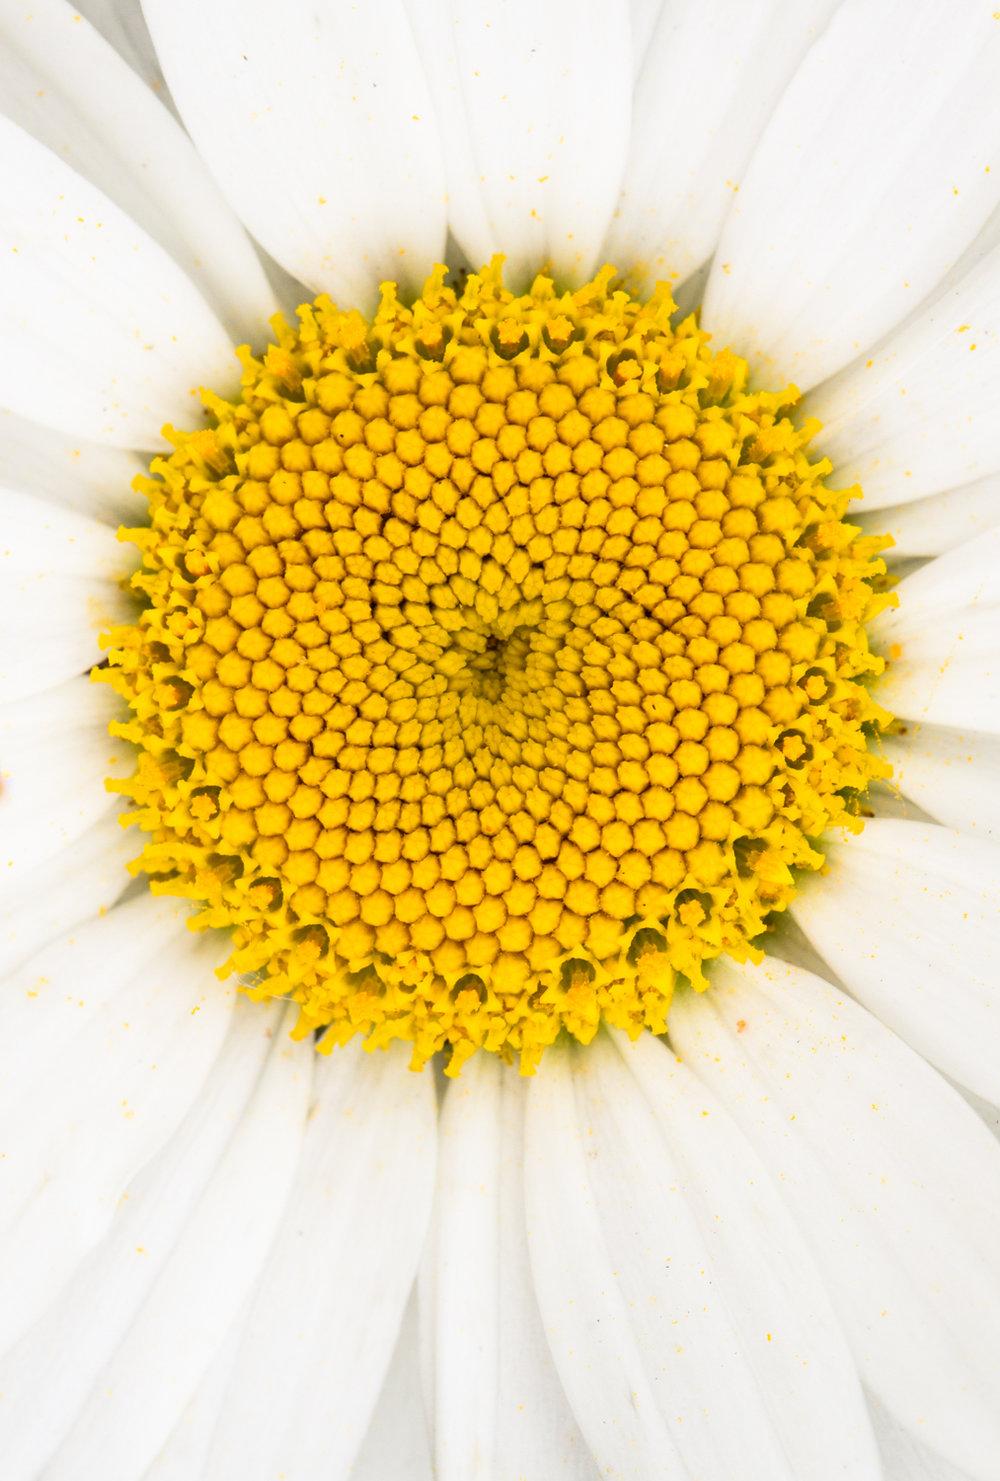 July-Blog-Macro-Photography-Flora-Ann-Arbor-Jaymes-Dempsey-13.JPG